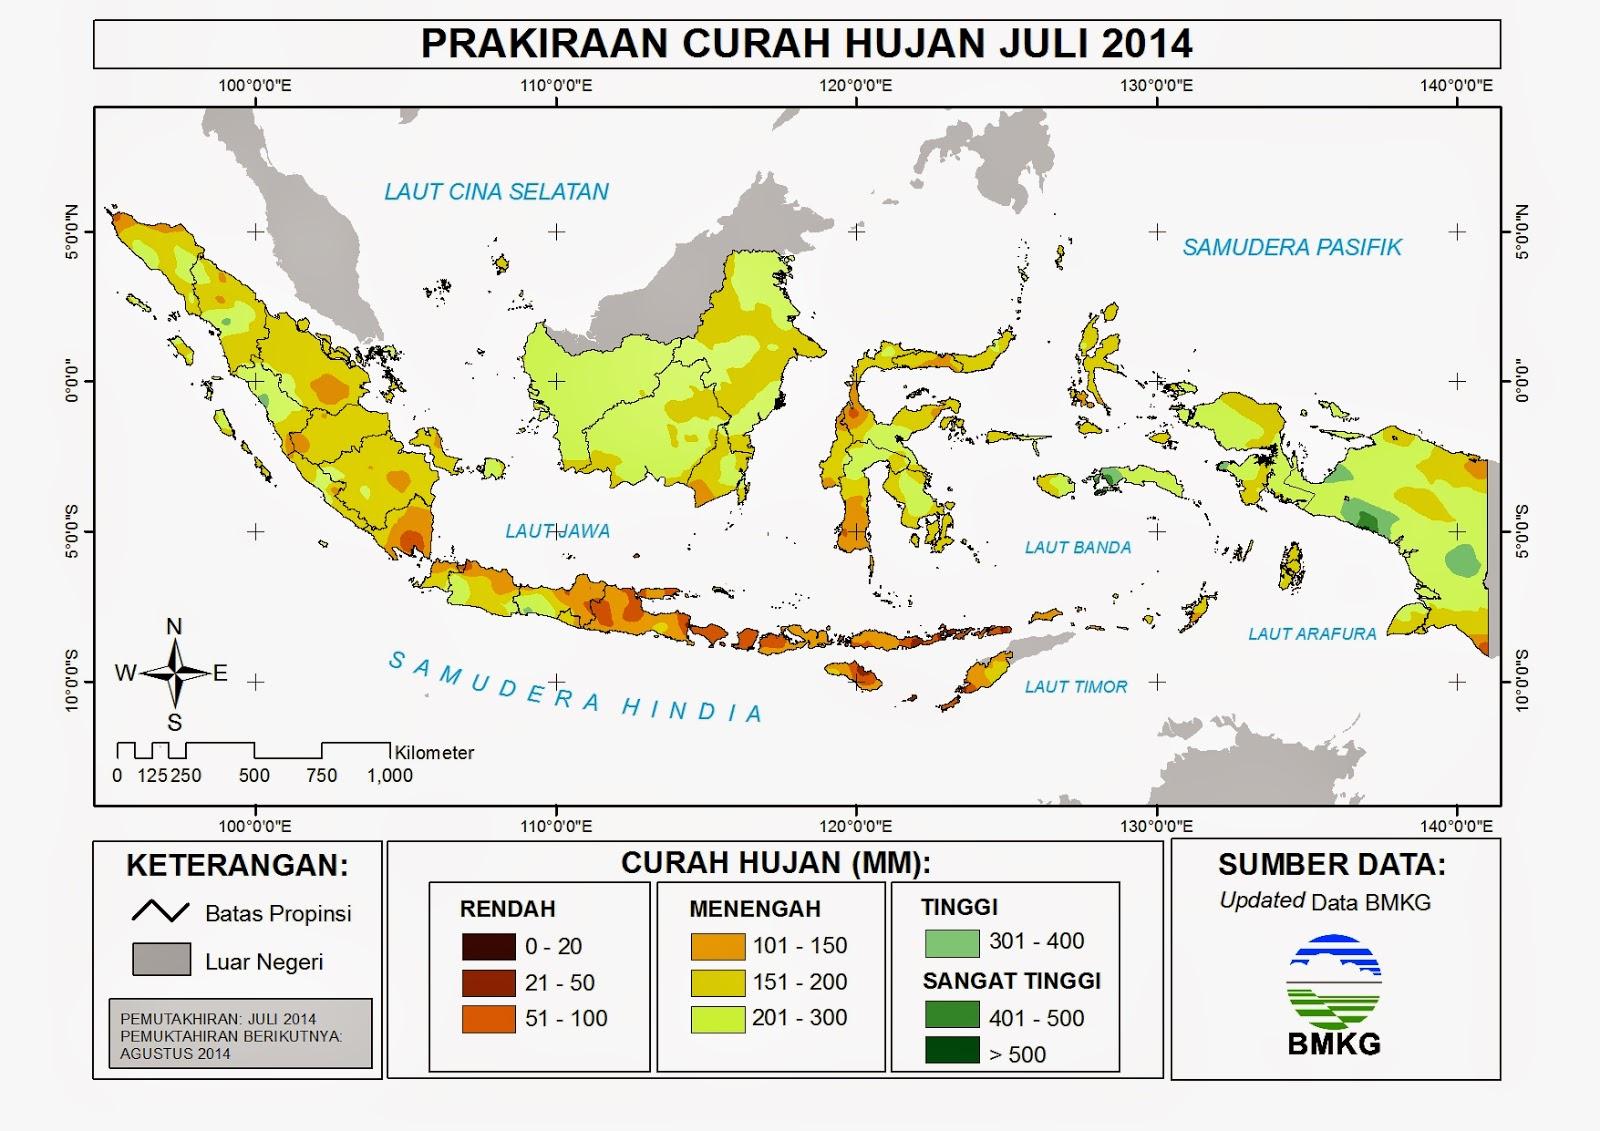 gambar peta curah hujan di indonesia